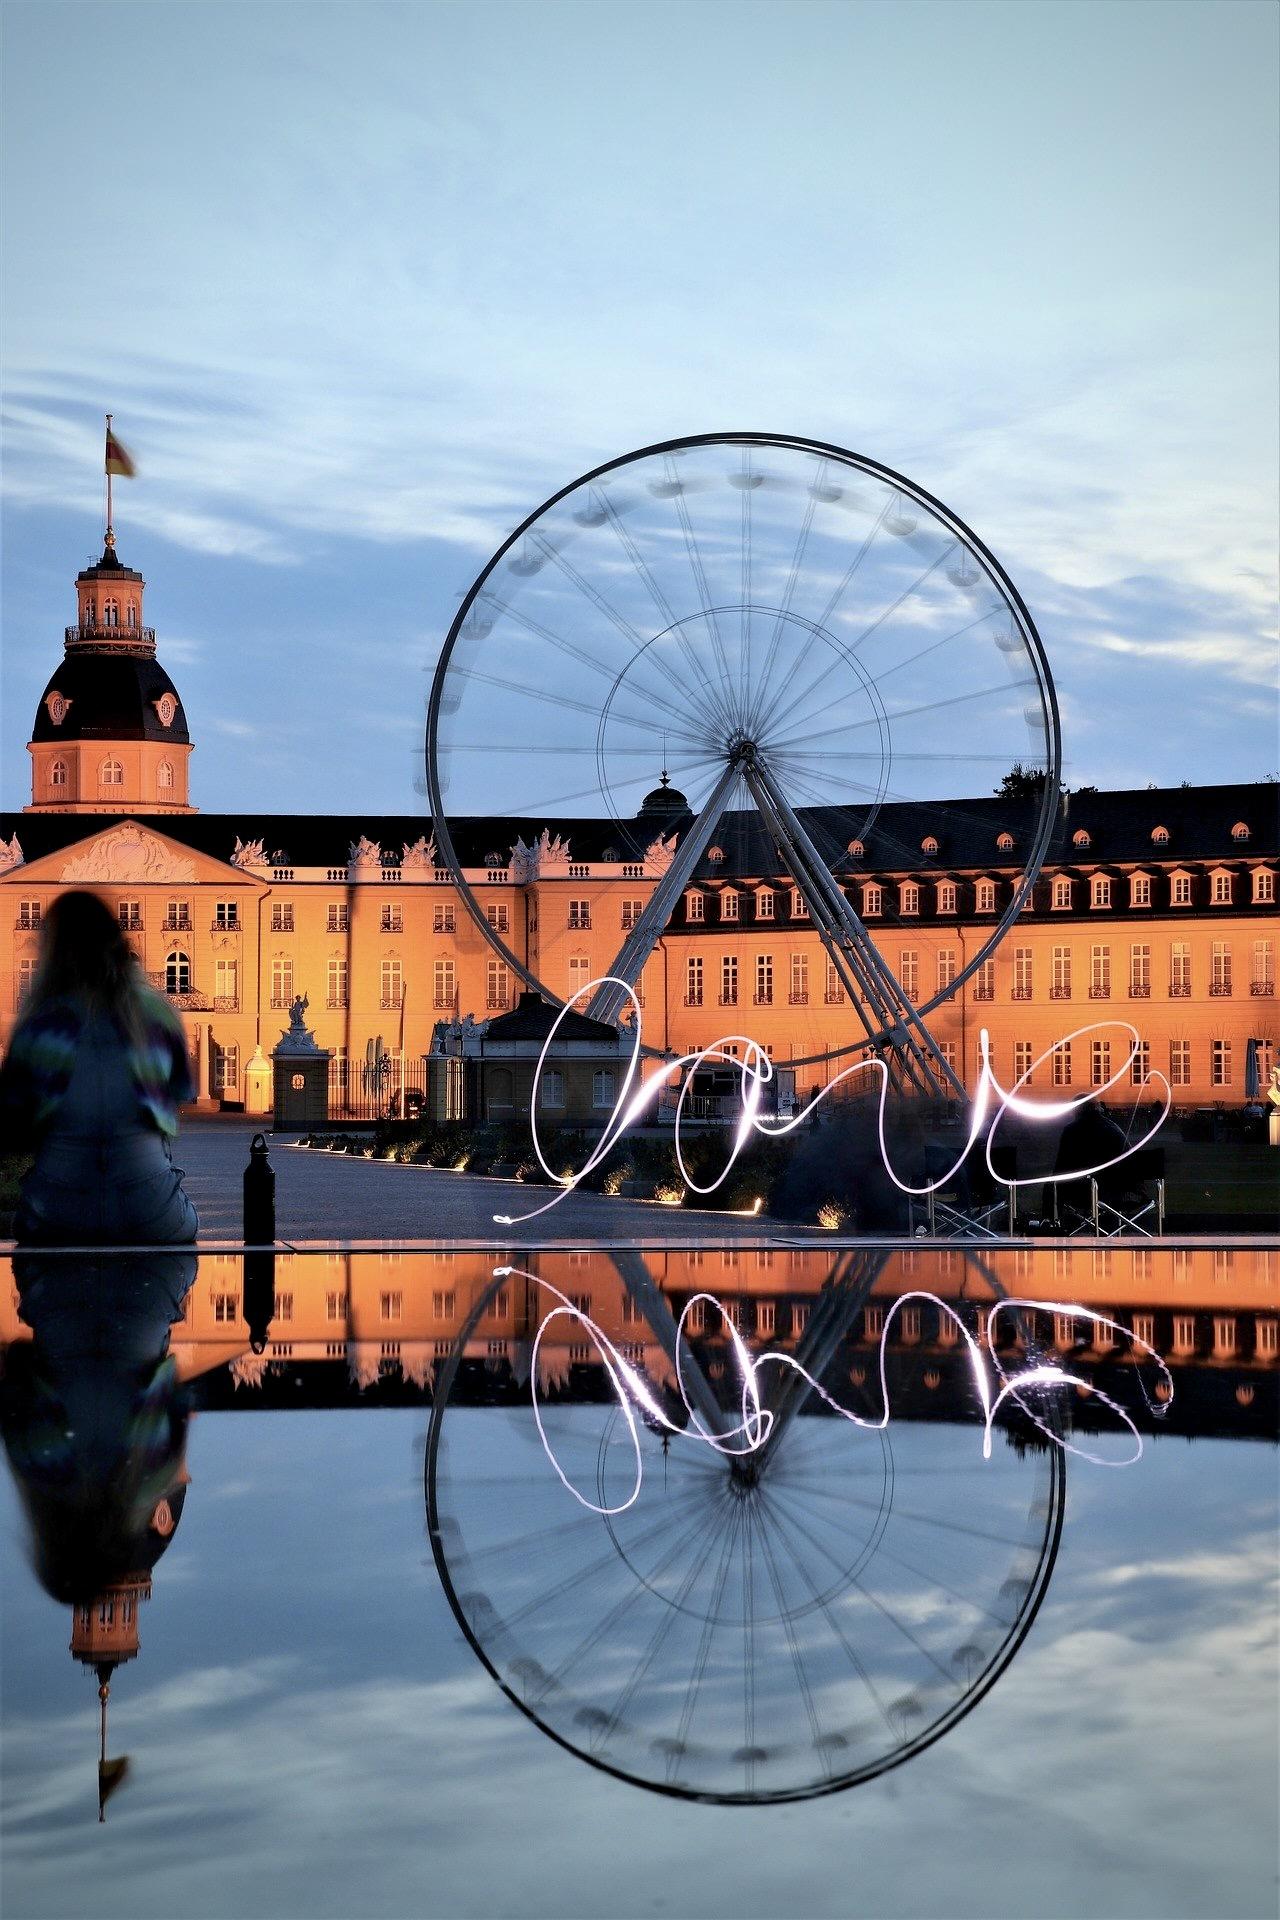 Das Schloss Karlsruhe ist am Abend sehenswert